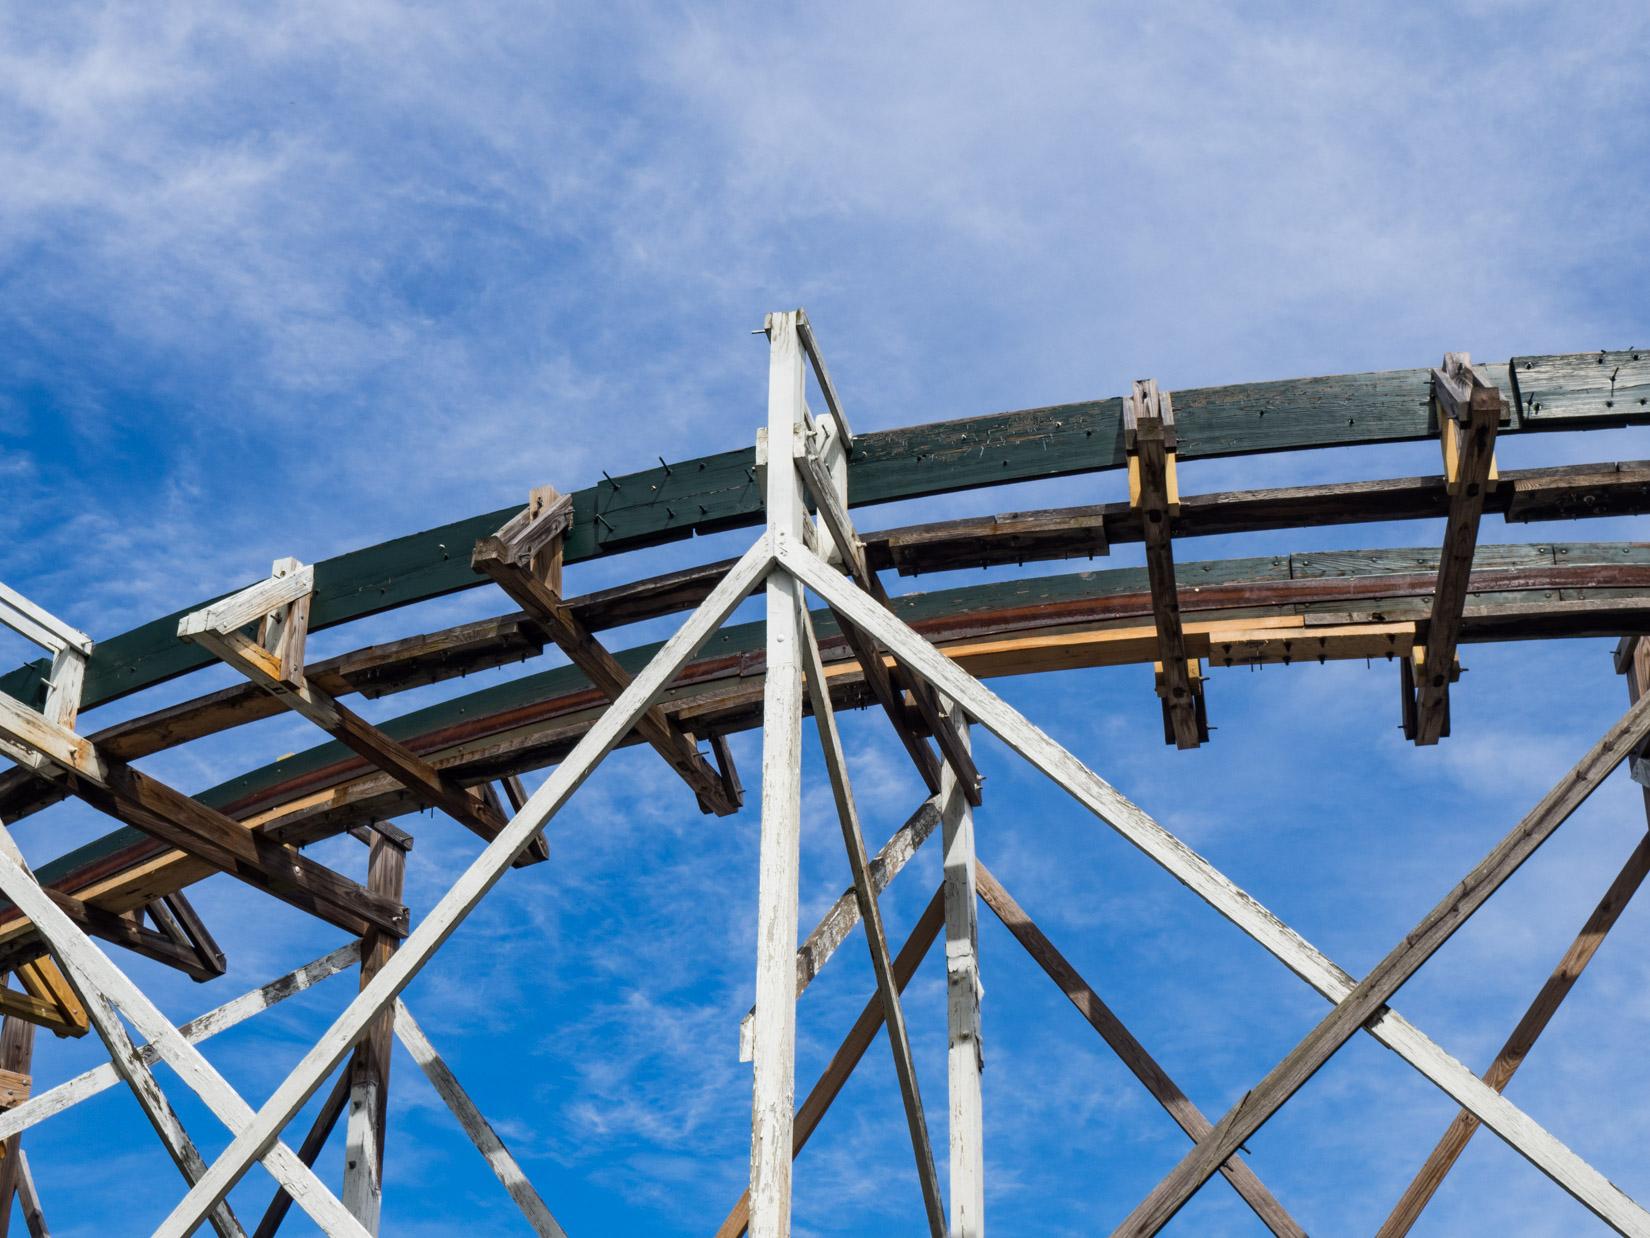 Wooden Rollercoaster Tracks Under Blue Sky